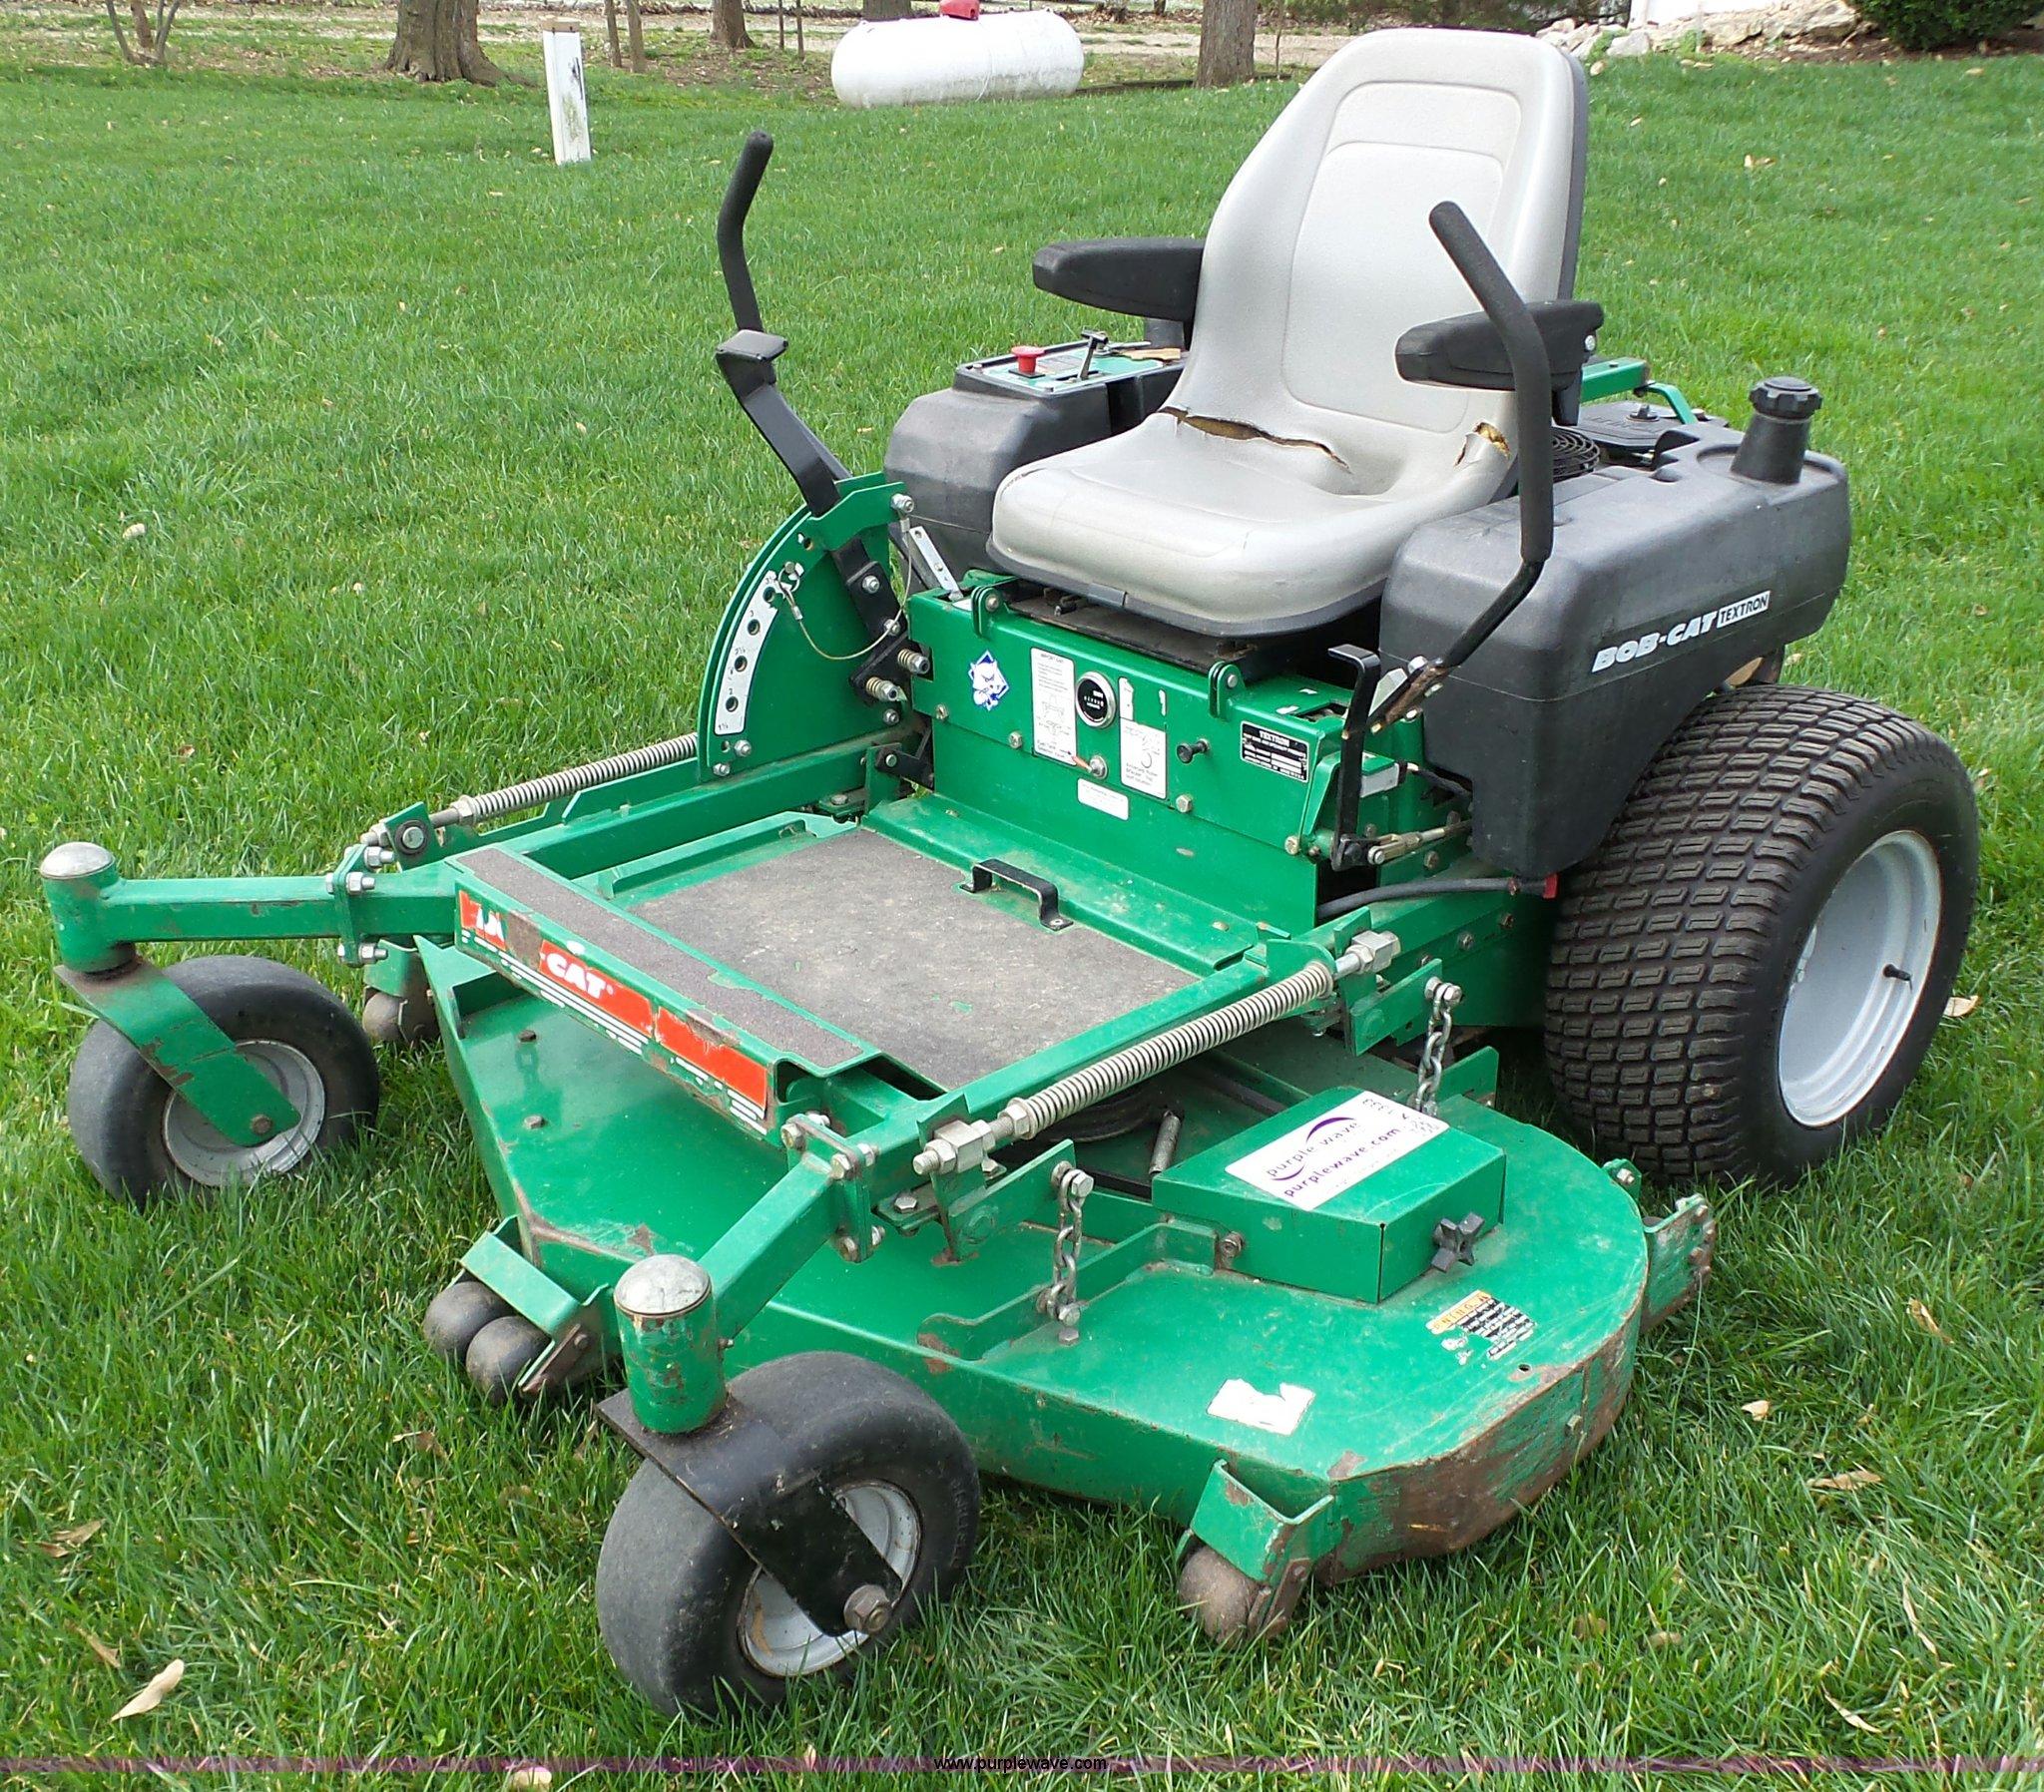 textron bobcat ztr lawn mower item k1333 sold may 18 ve rh purplewave com Bobcat Textron Mower Bagger Bobcat Mowers Dealers